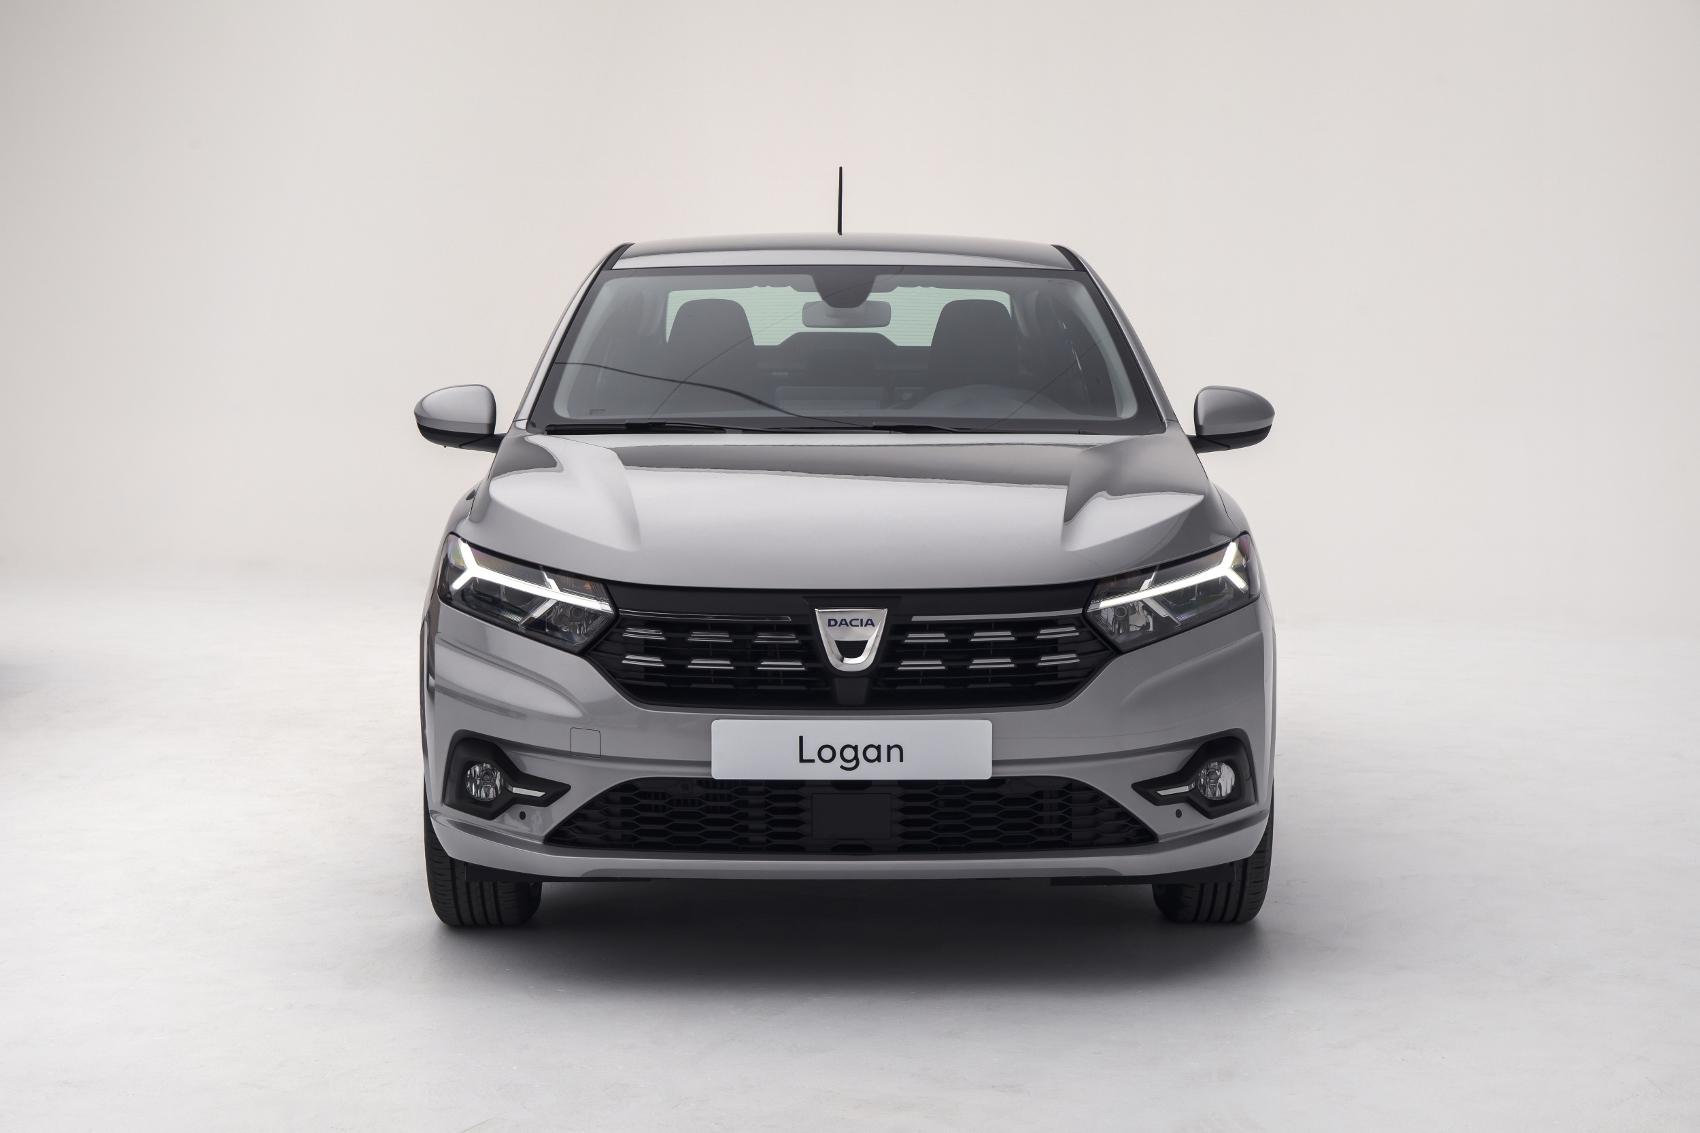 2020 - New Dacia LOGAN (2) (1700x1133)